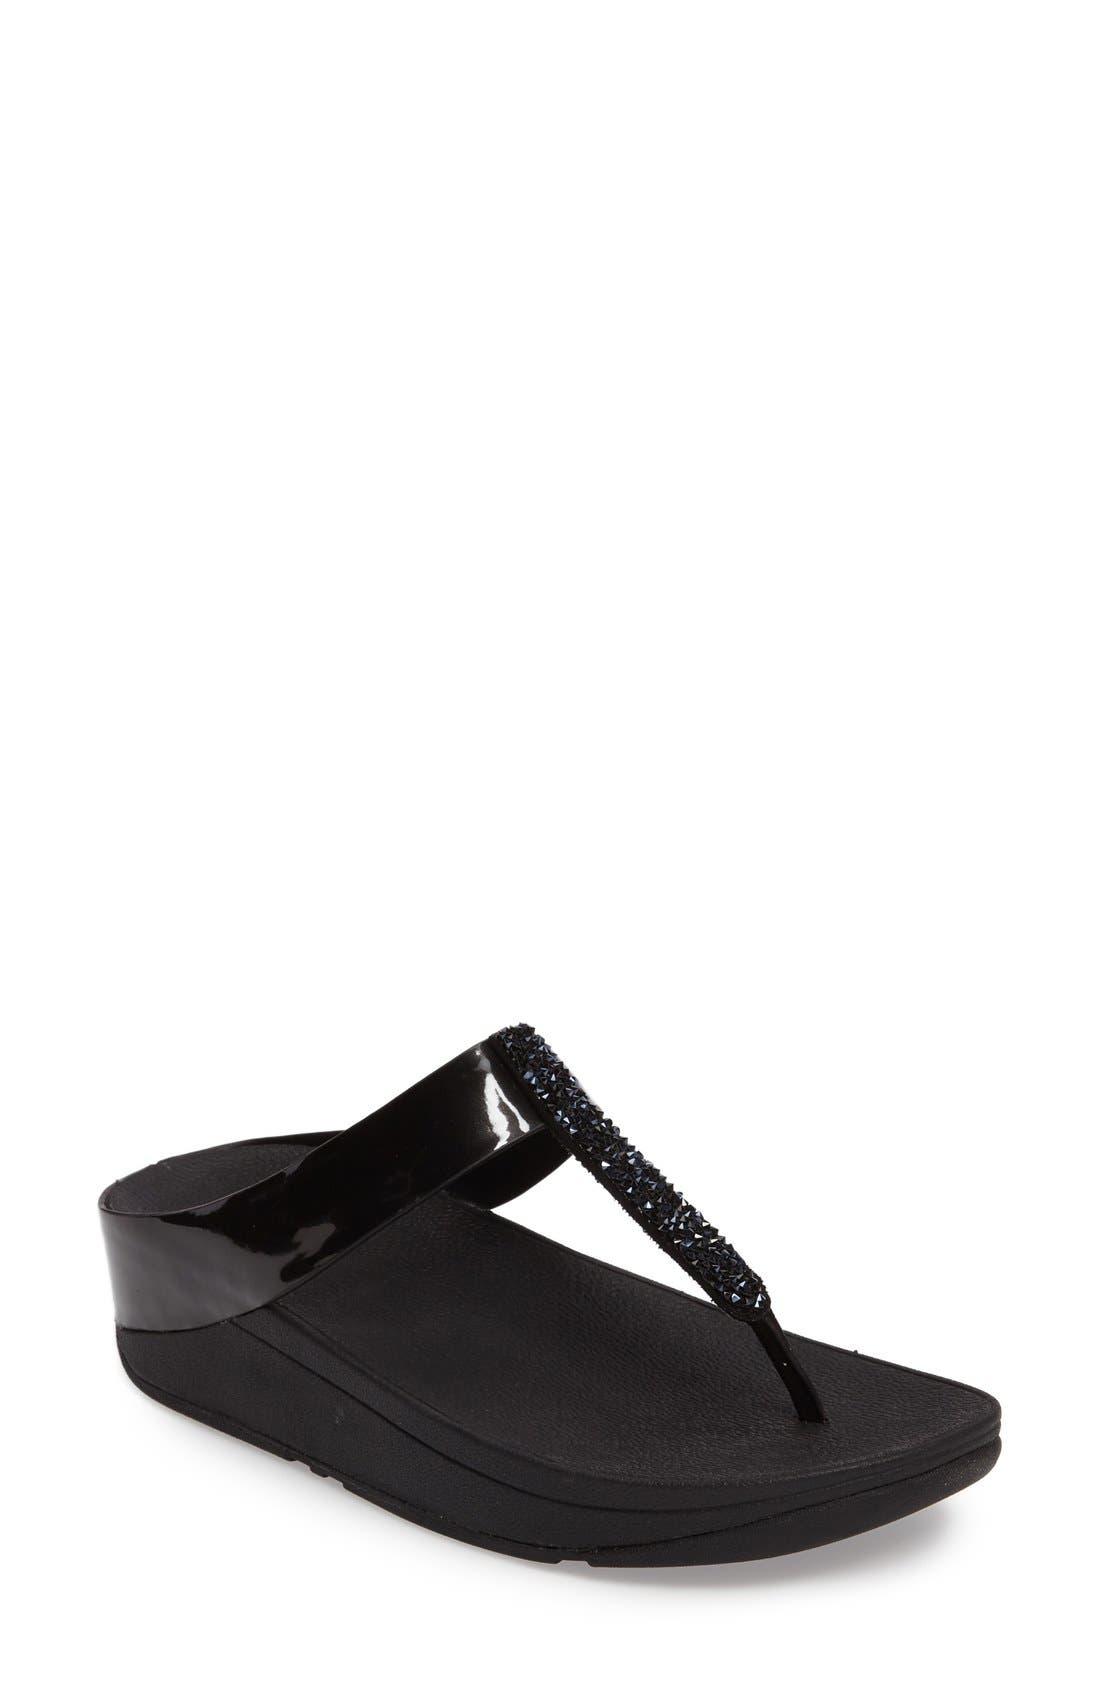 Alternate Image 1 Selected - FitFlop™ Fino Flip Flop Sandal (Women)